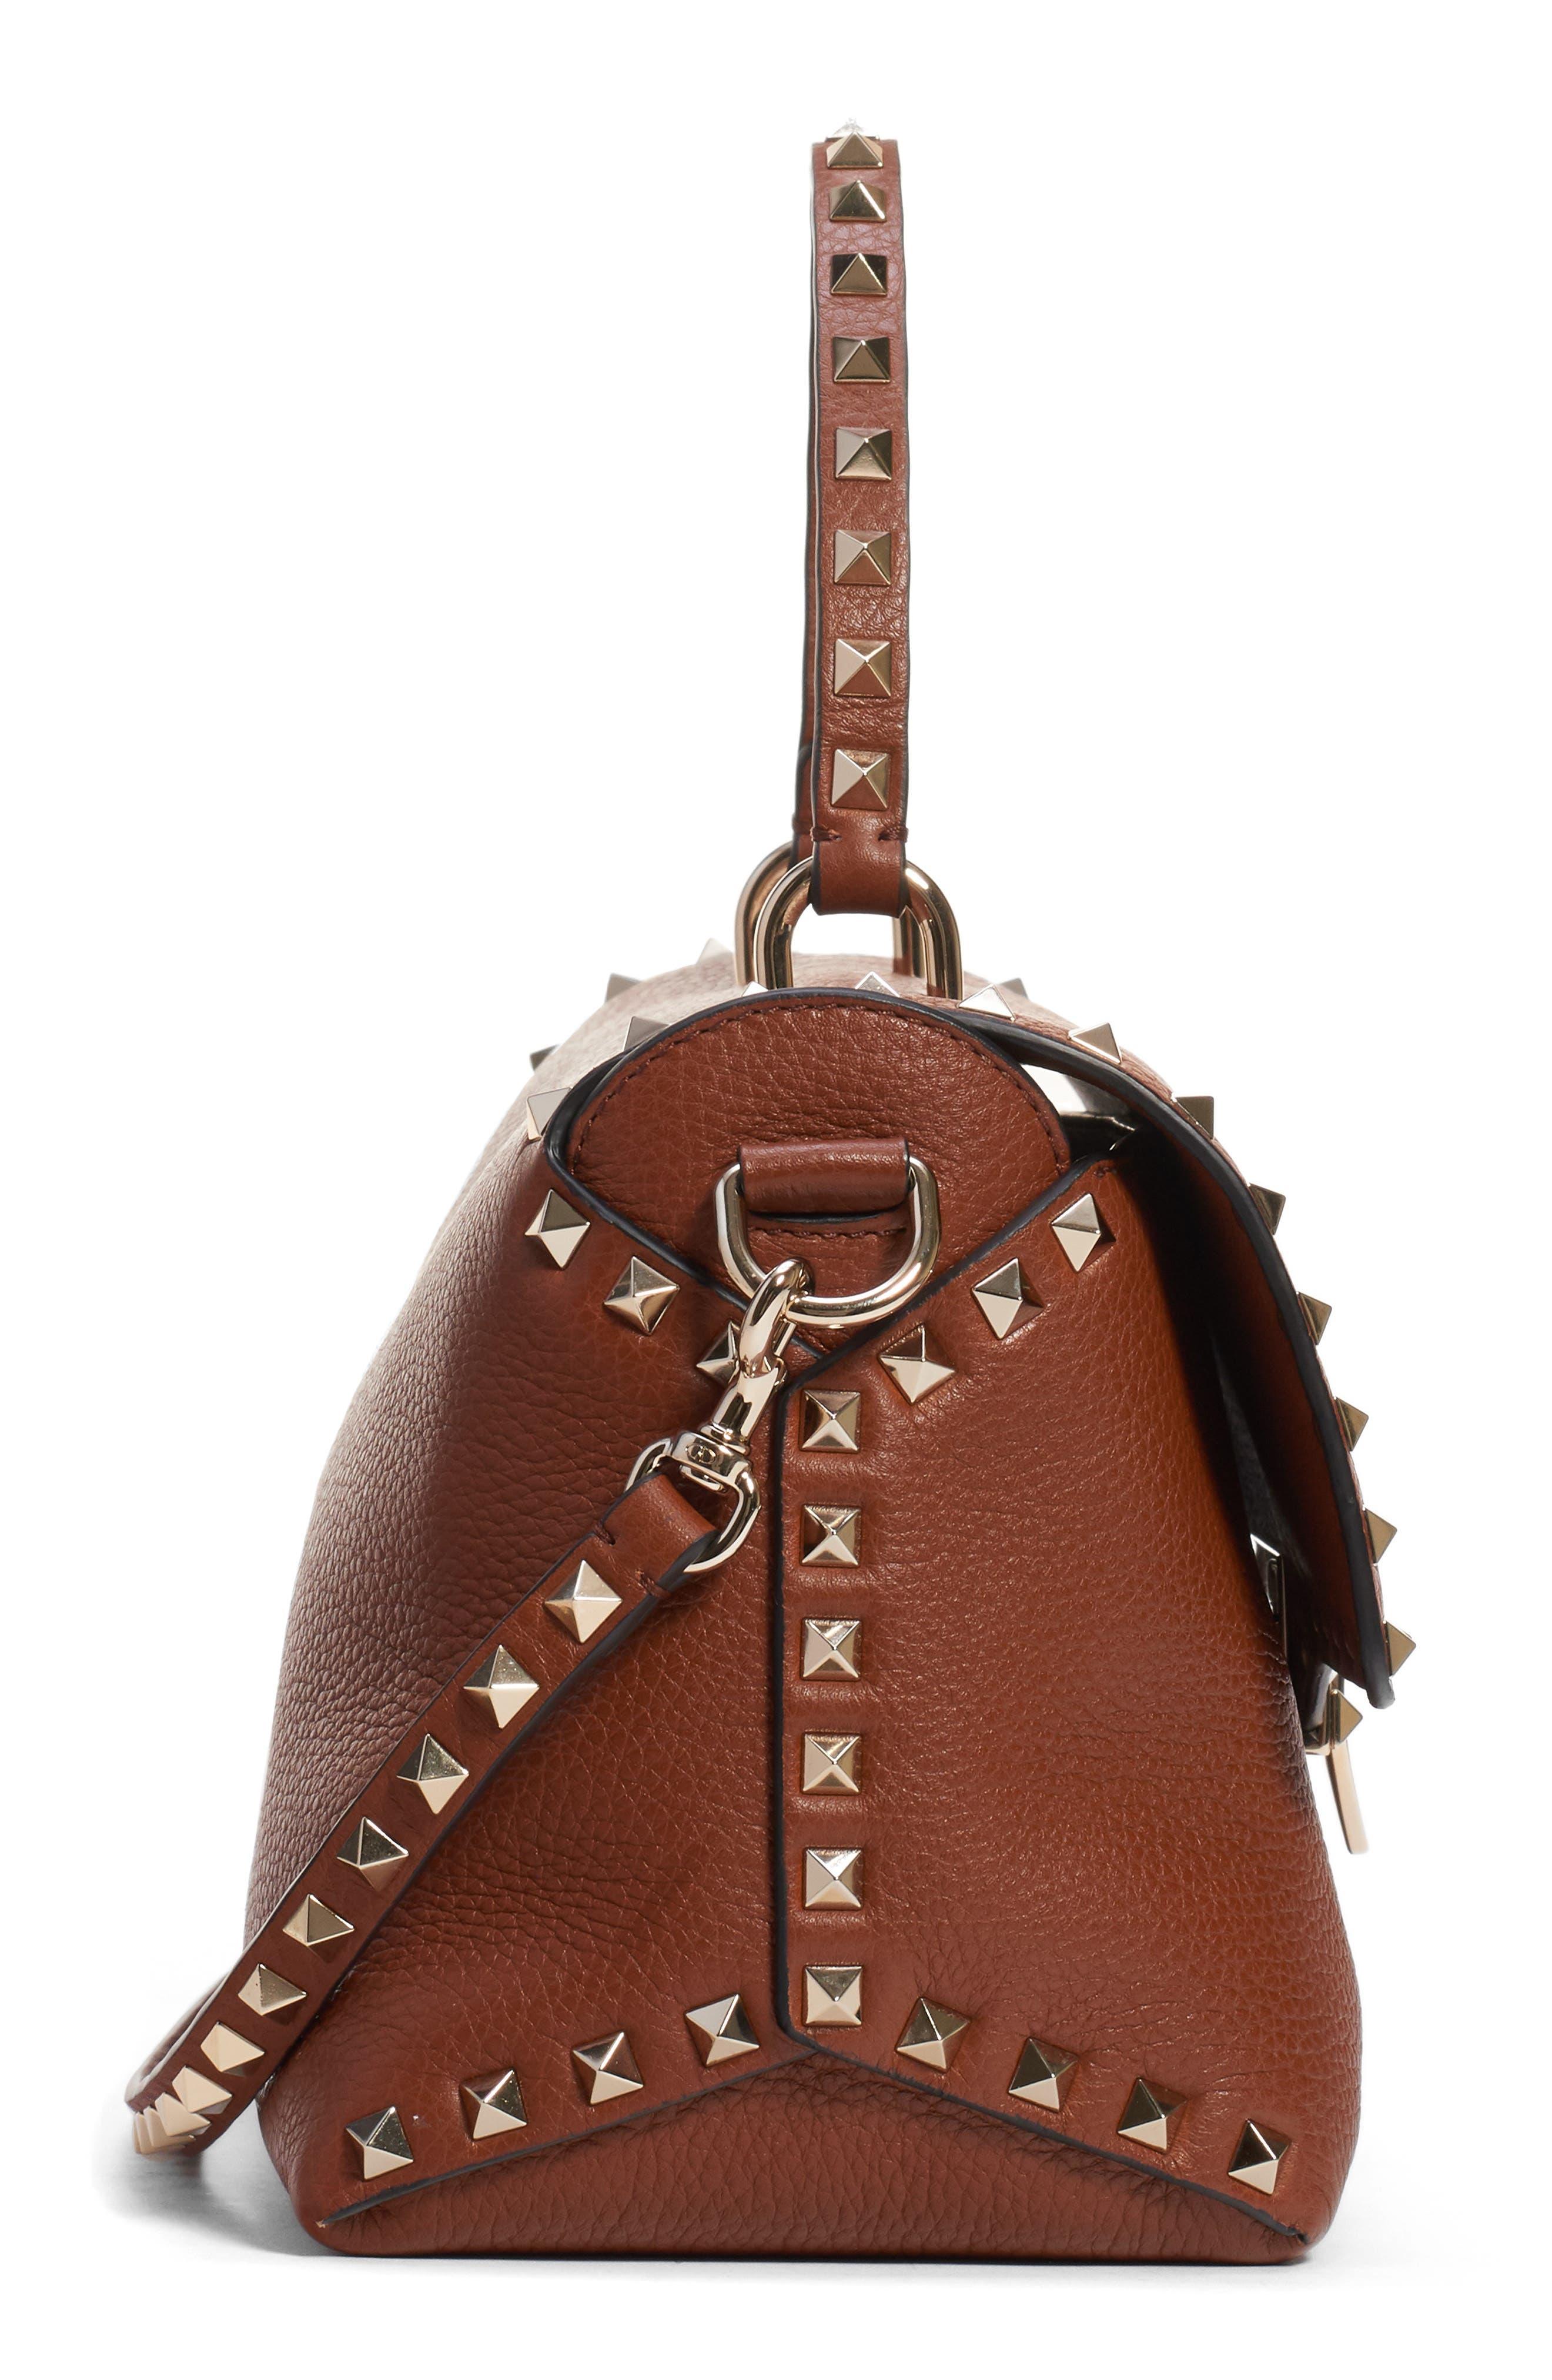 Medium Rockstud Leather Crossbody Bag,                             Alternate thumbnail 4, color,                             BRIGHT COGNAC